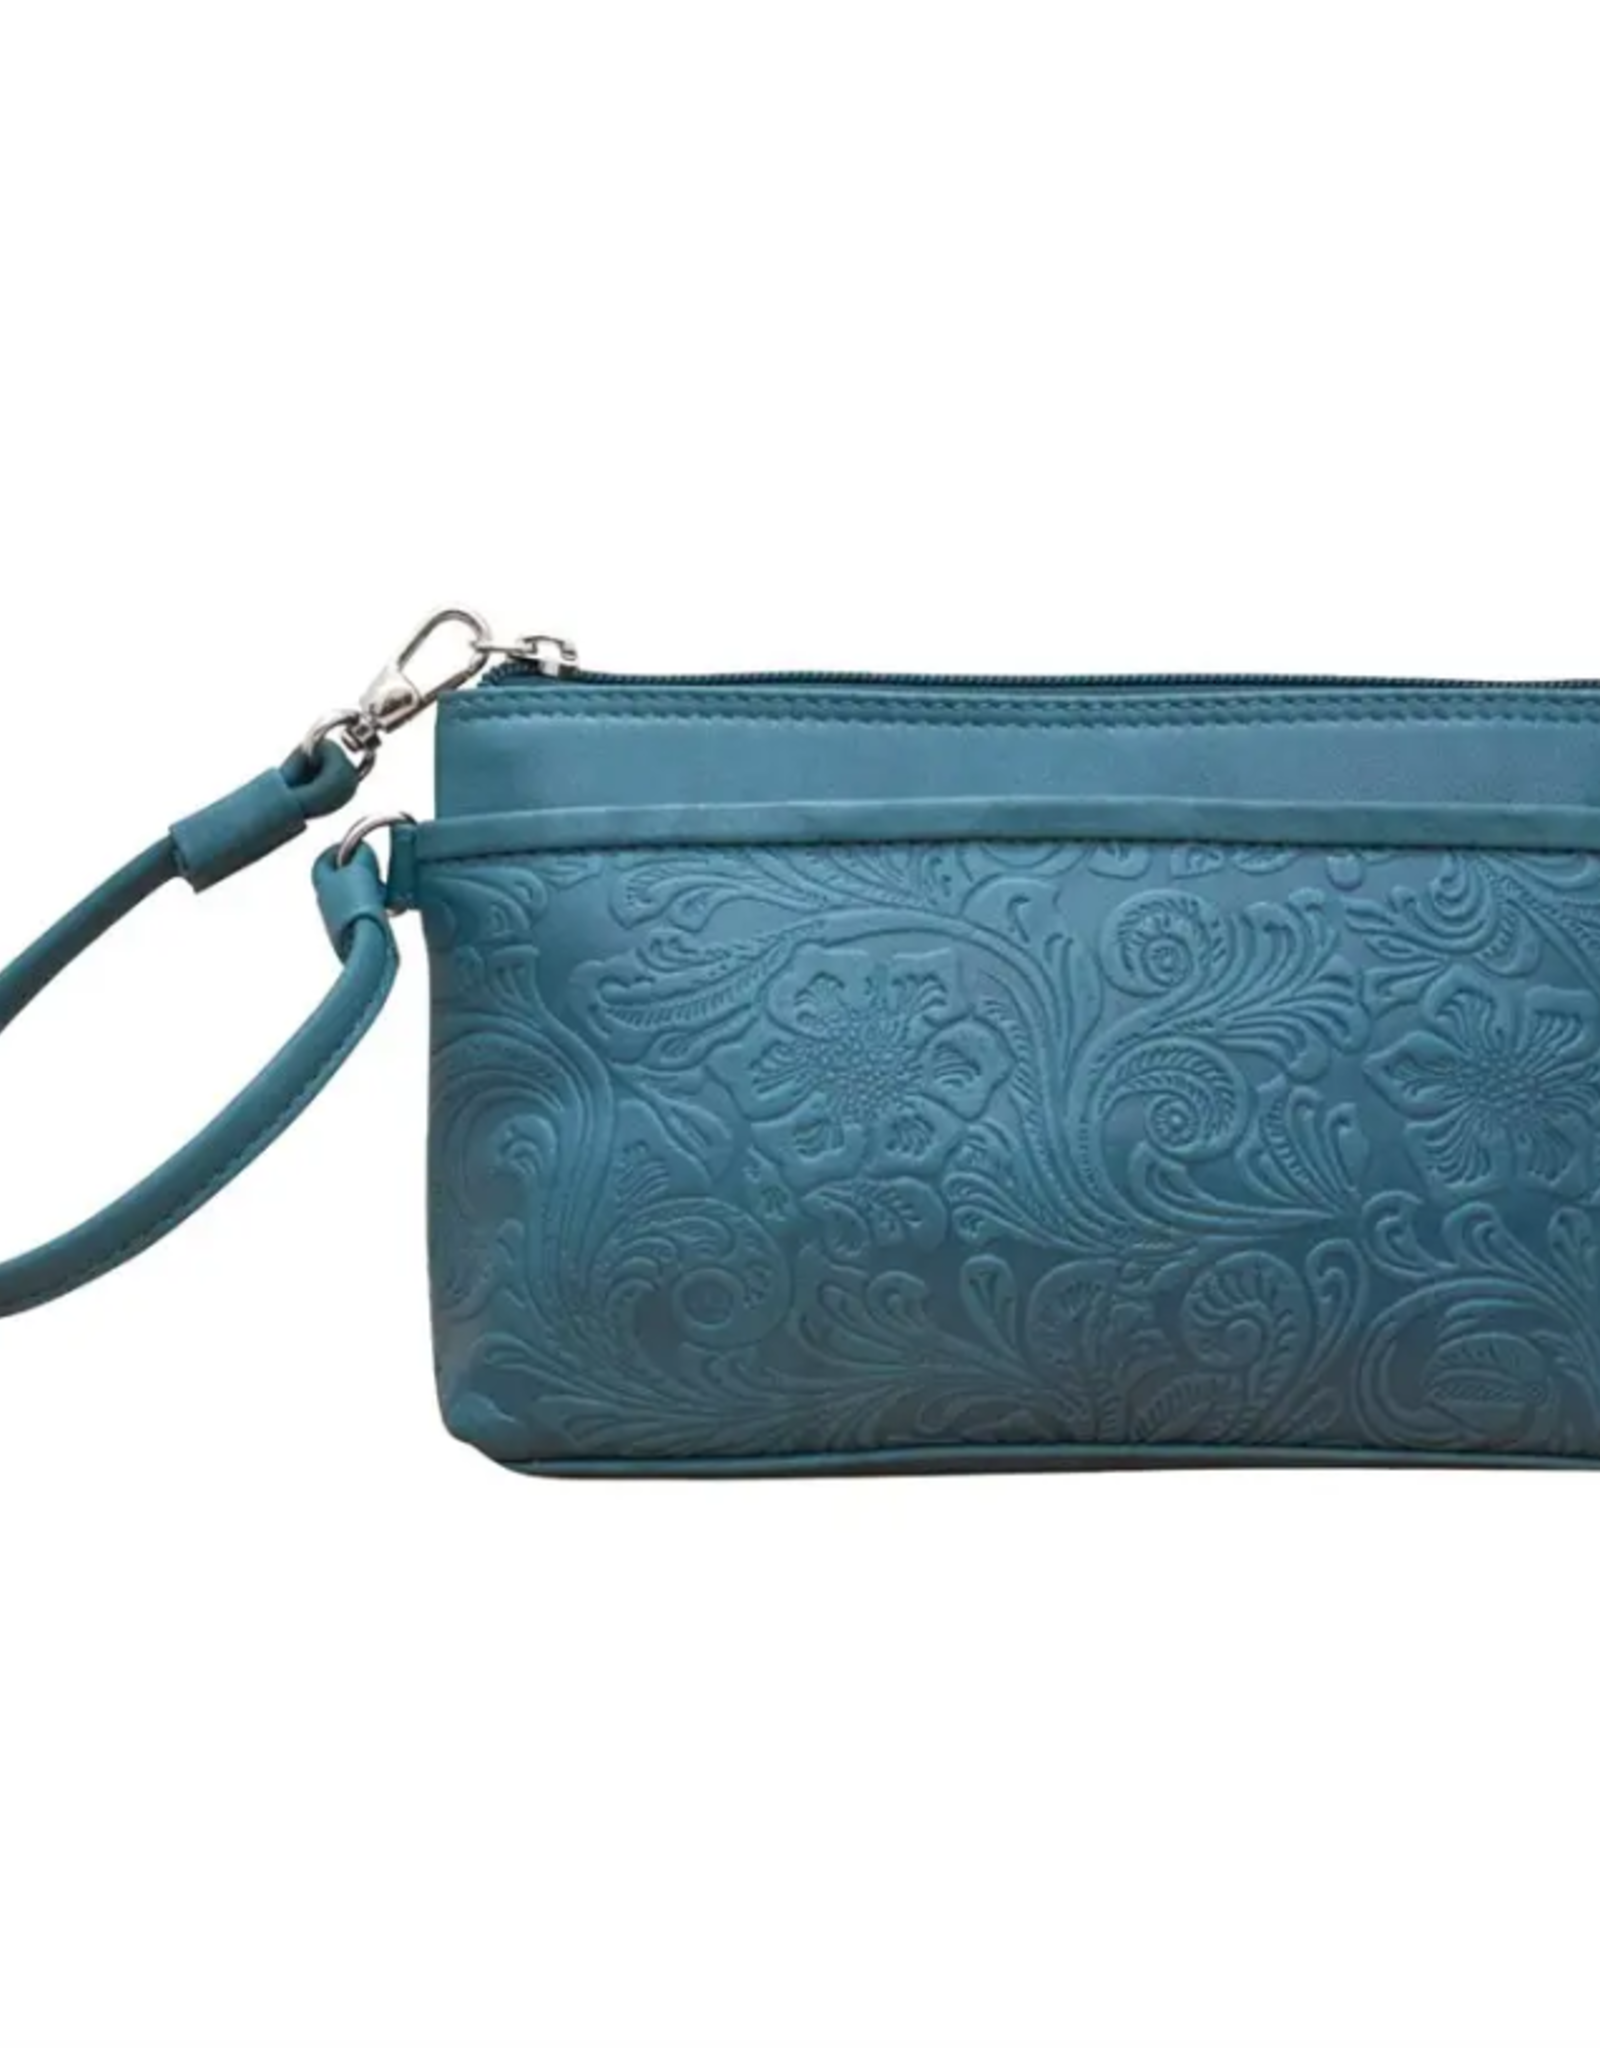 ili New York Cheyenne leather wristlet- Jeans Blue